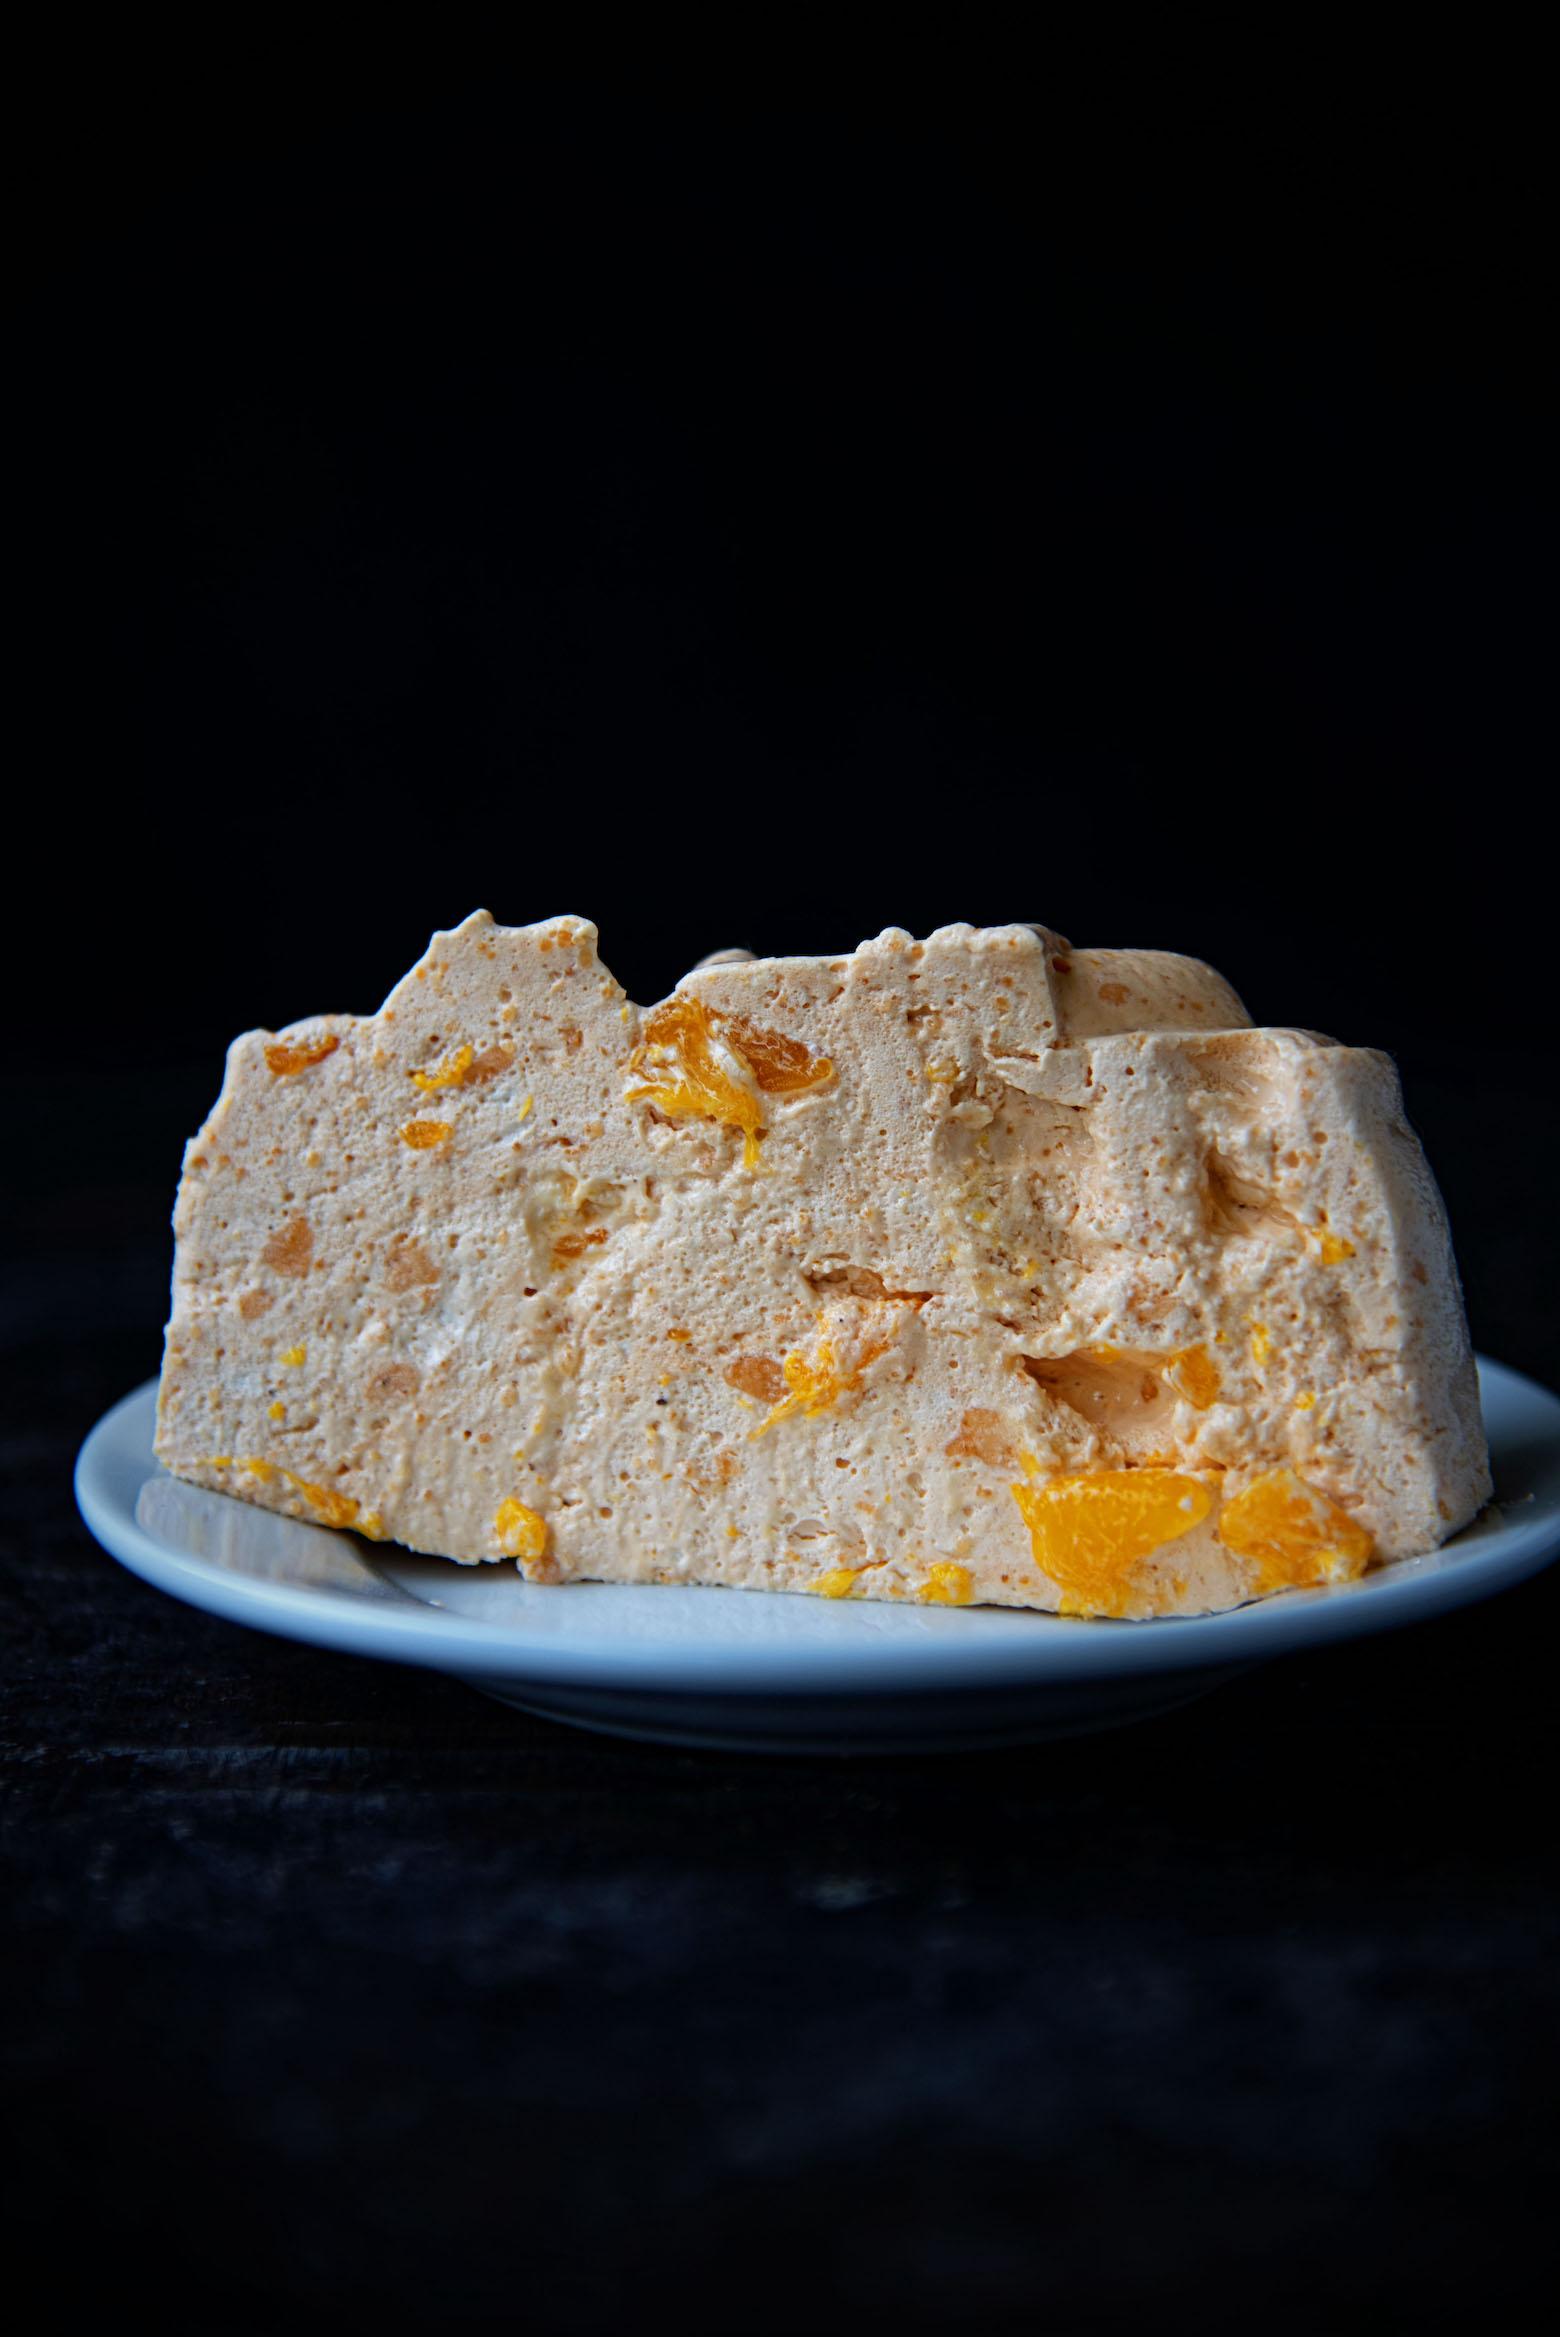 Orange Gingerbread Jell-O Mold